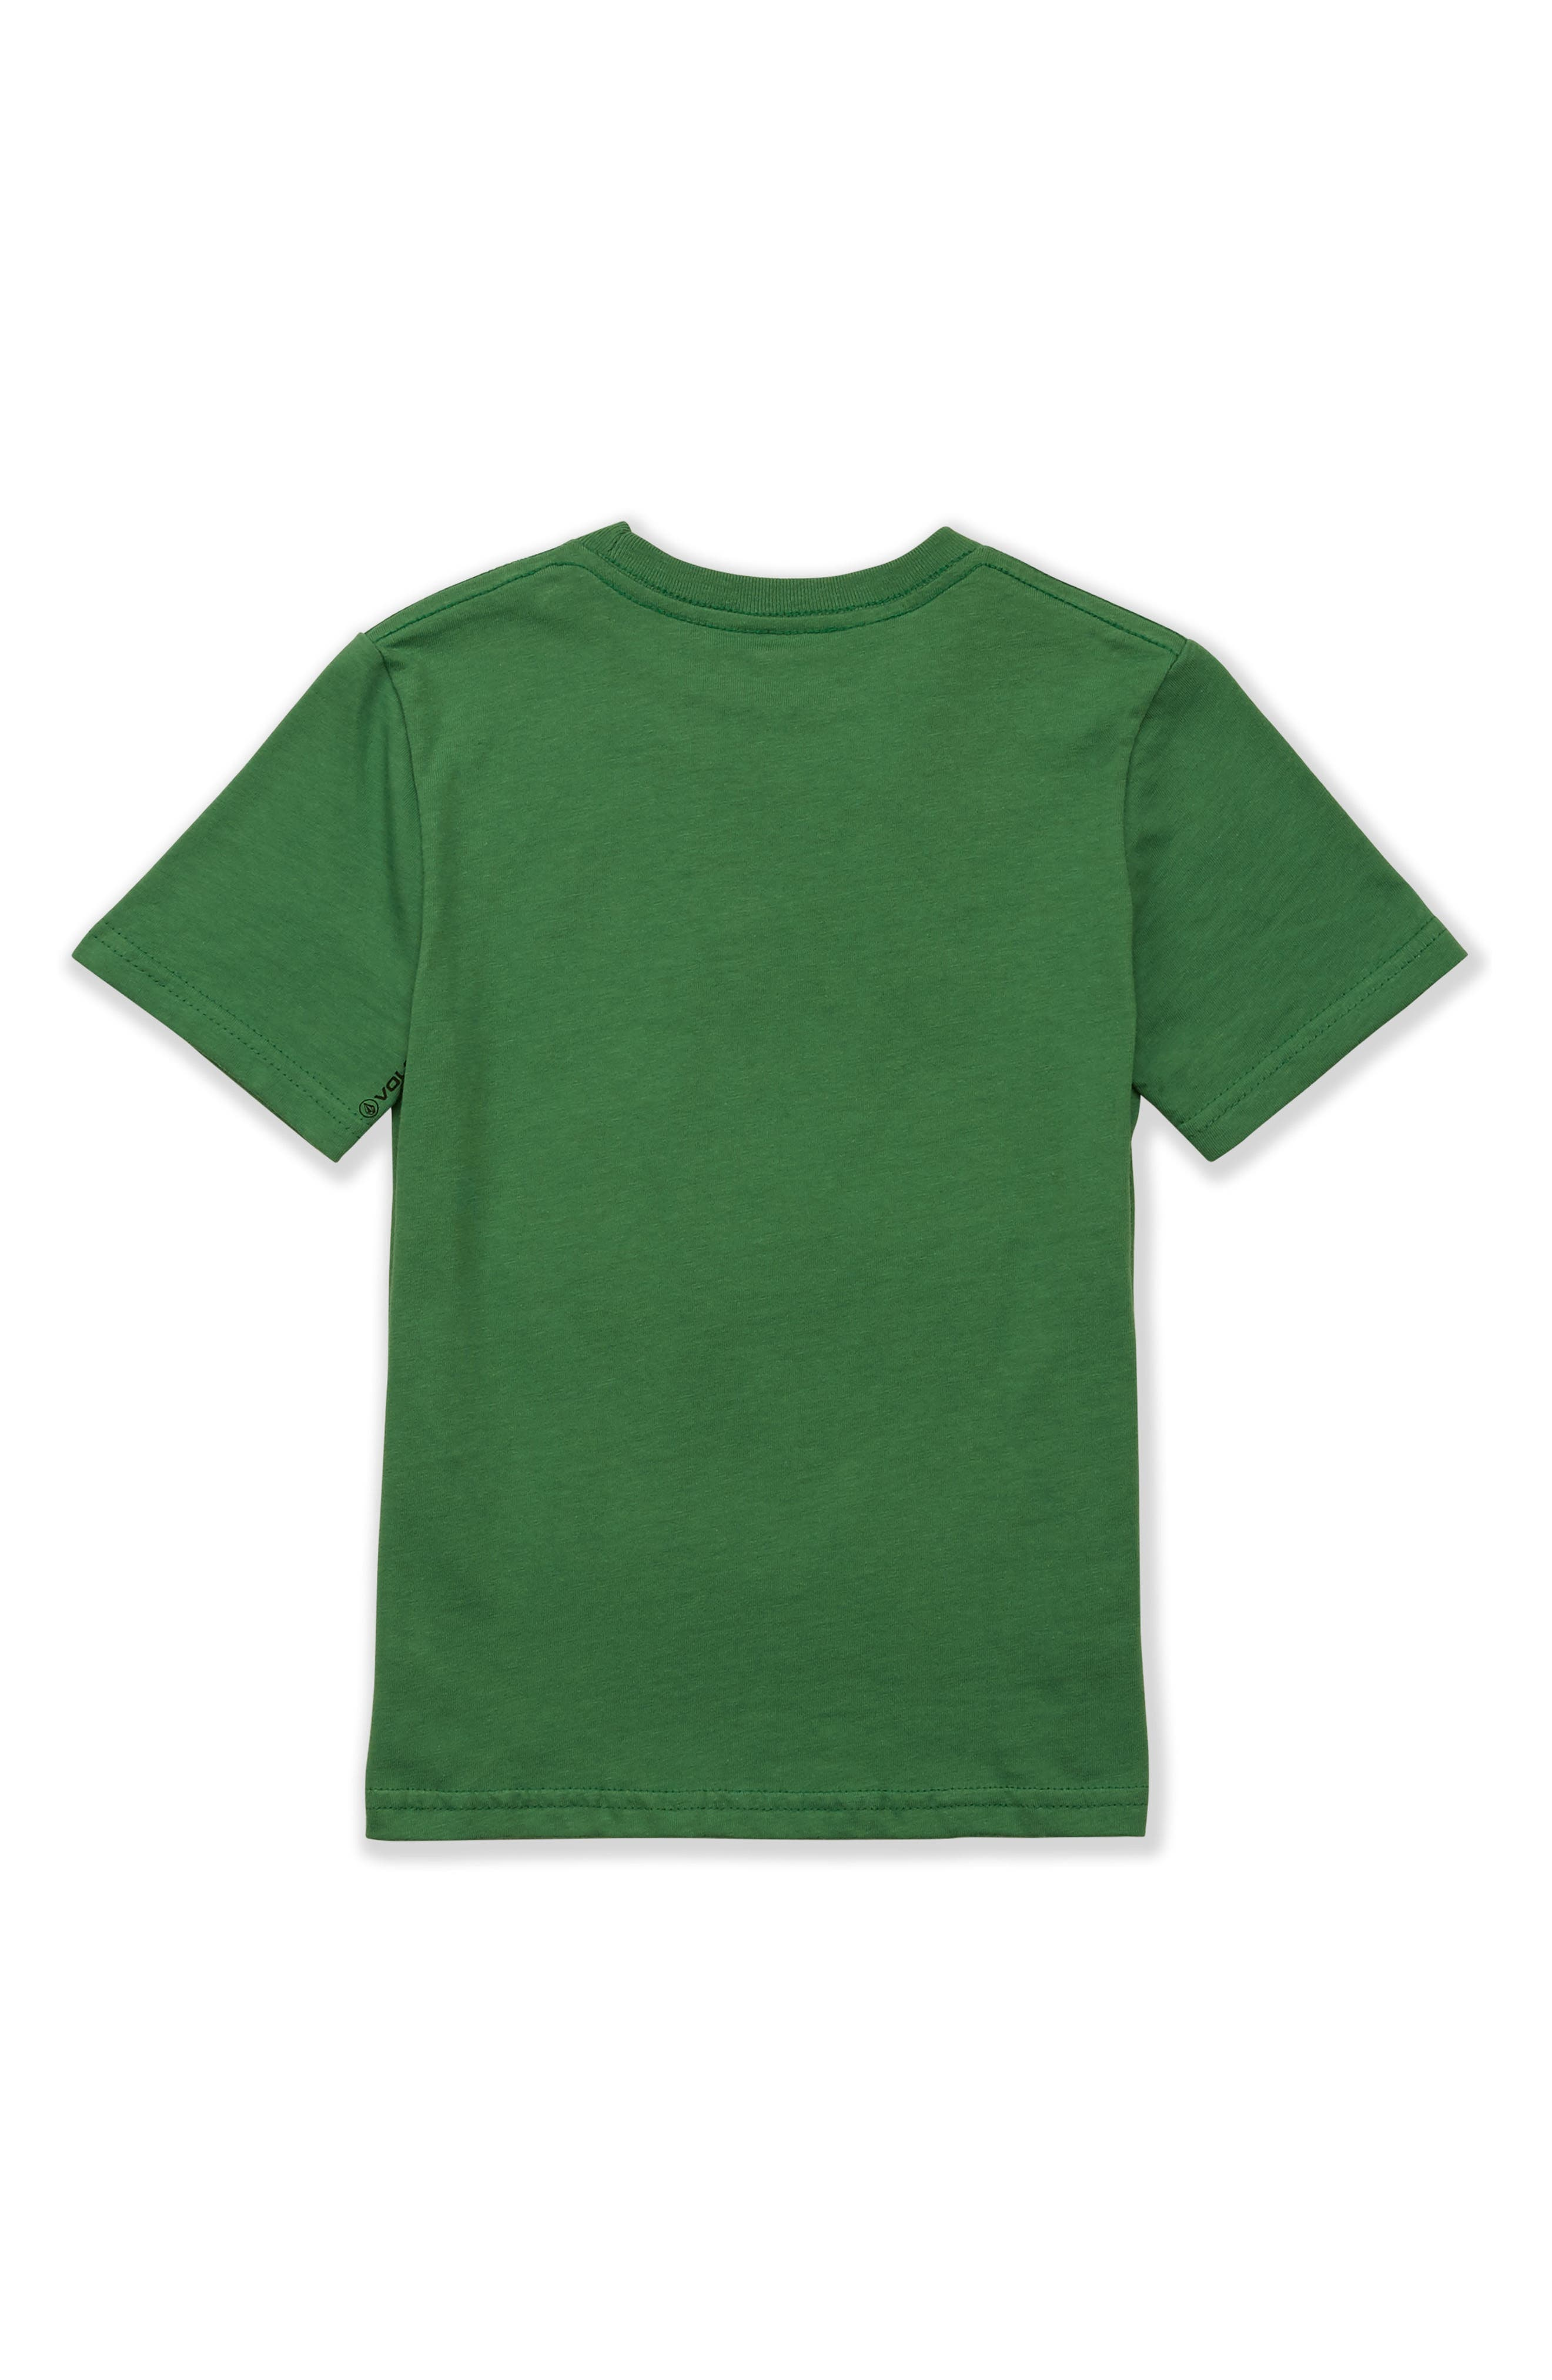 Crisp Stone Logo Graphic T-Shirt,                             Alternate thumbnail 2, color,                             DARK KELLY